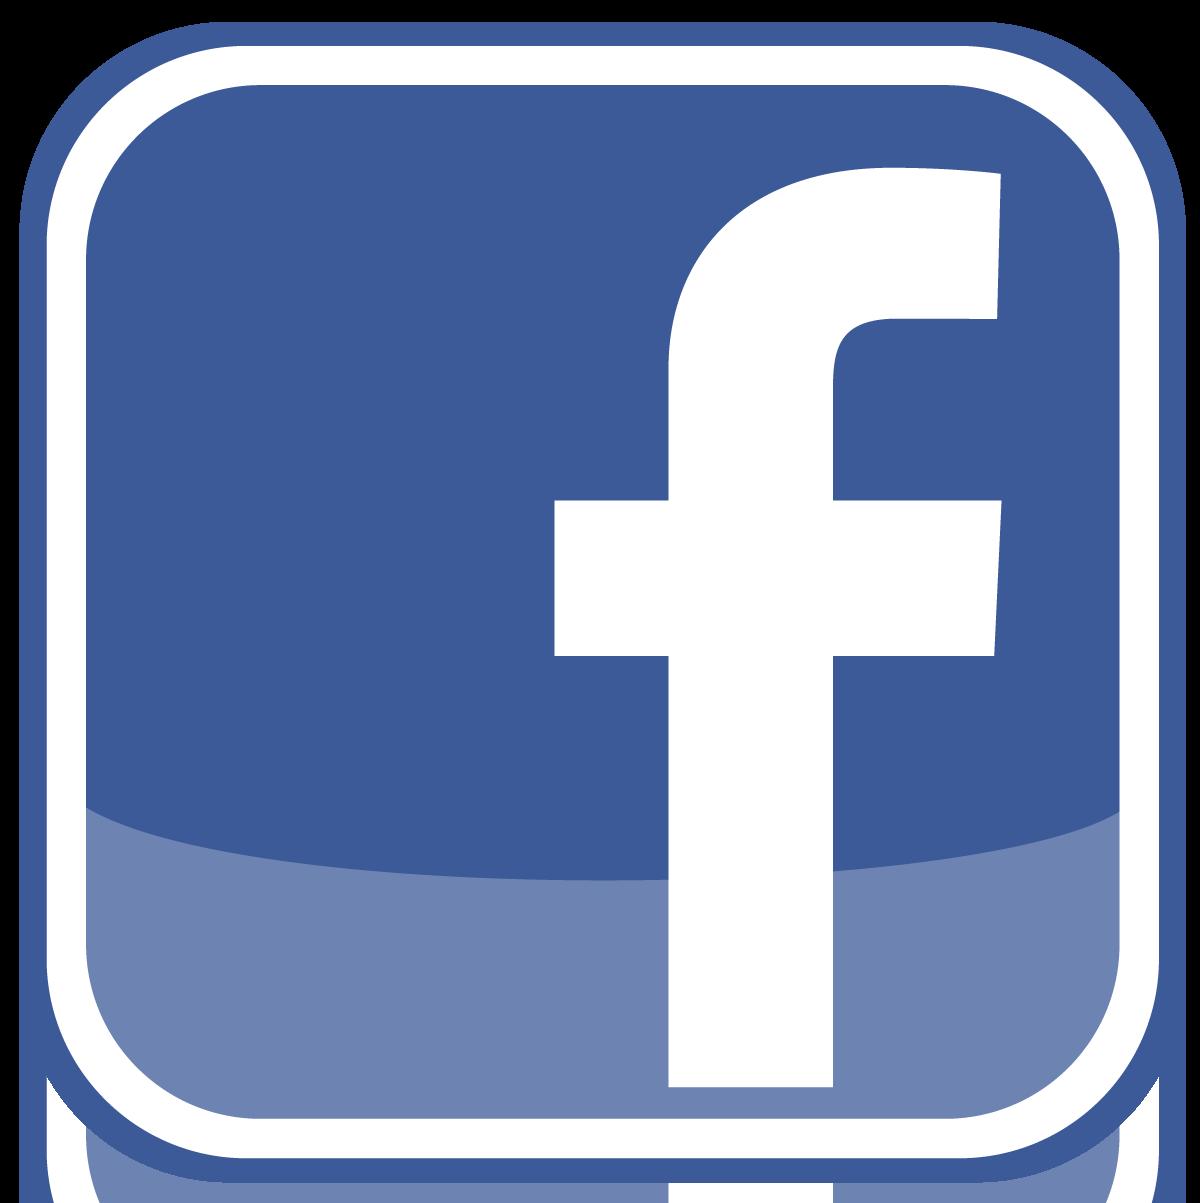 https://www.facebook.com/moptiki/